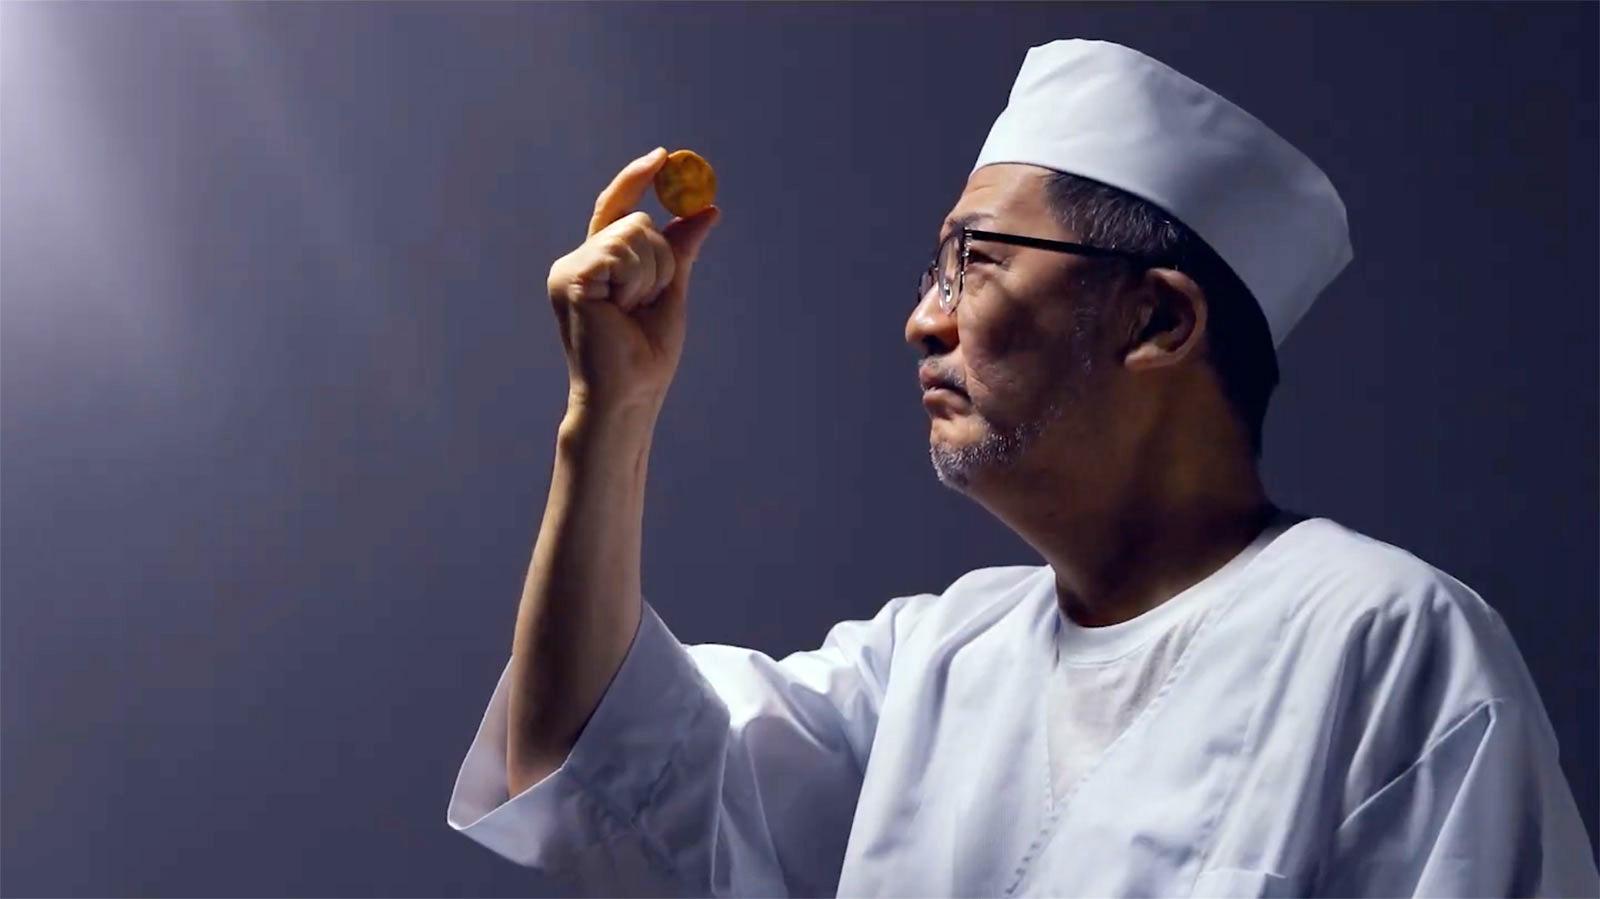 Seiko Presage Senbei rice cracker 2